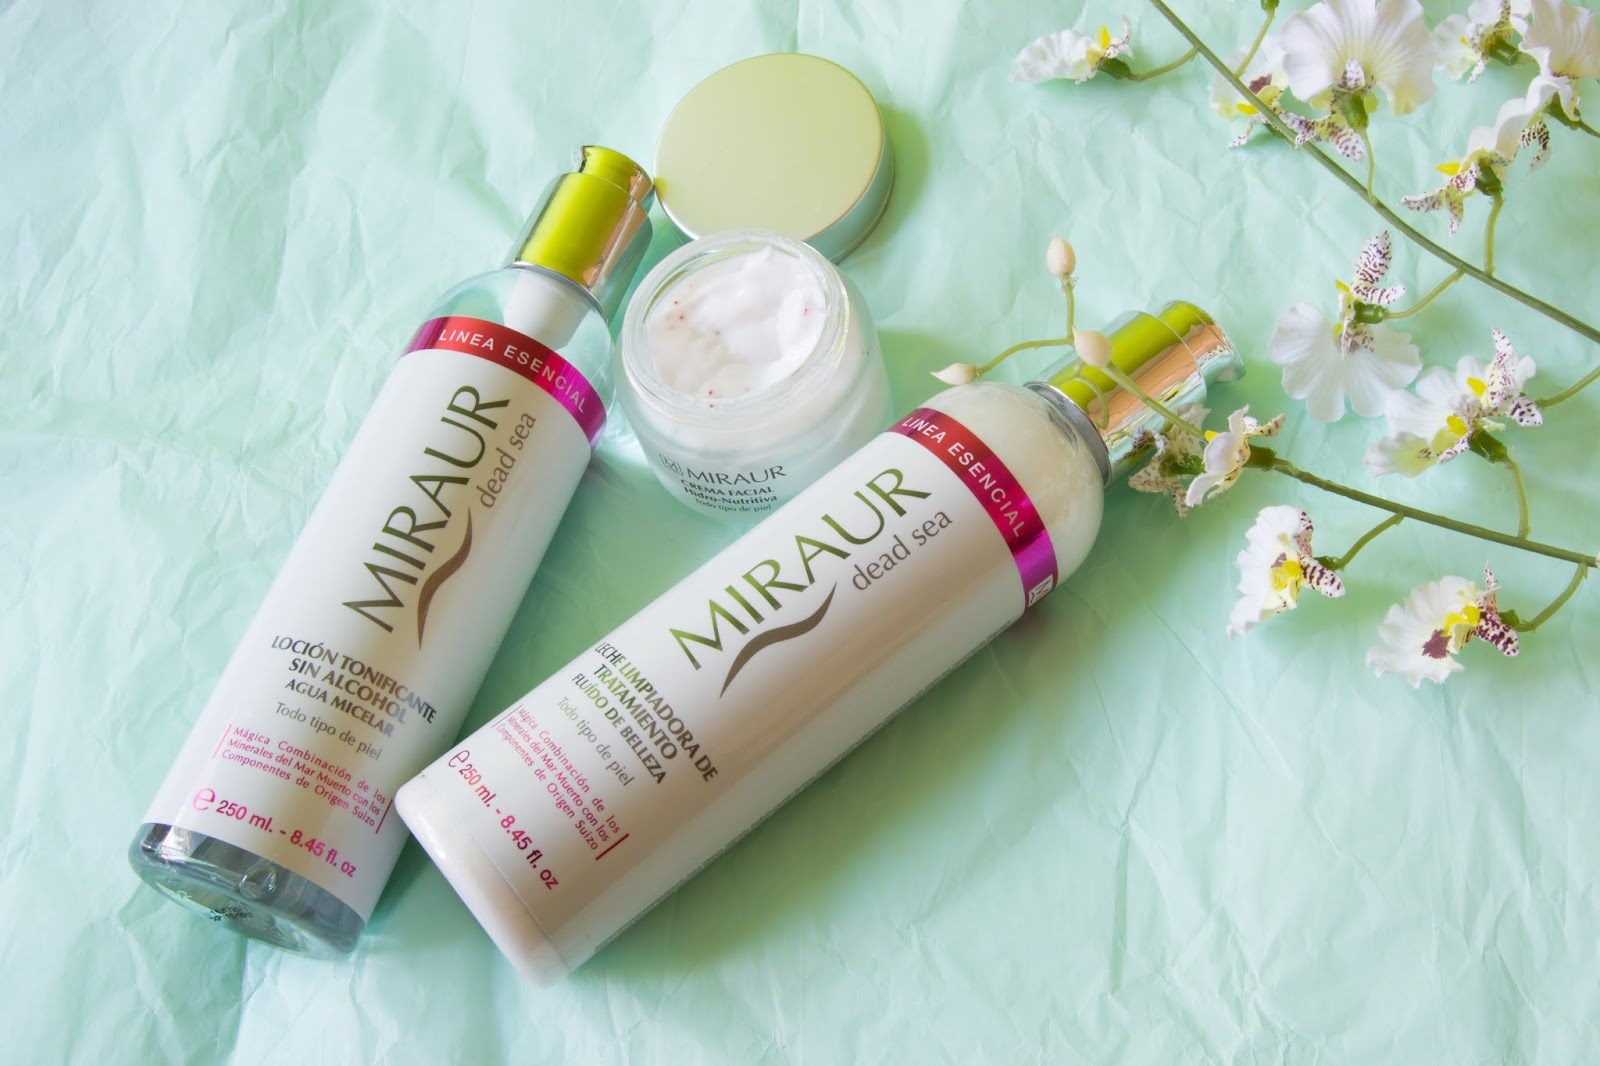 Miraur, Products I